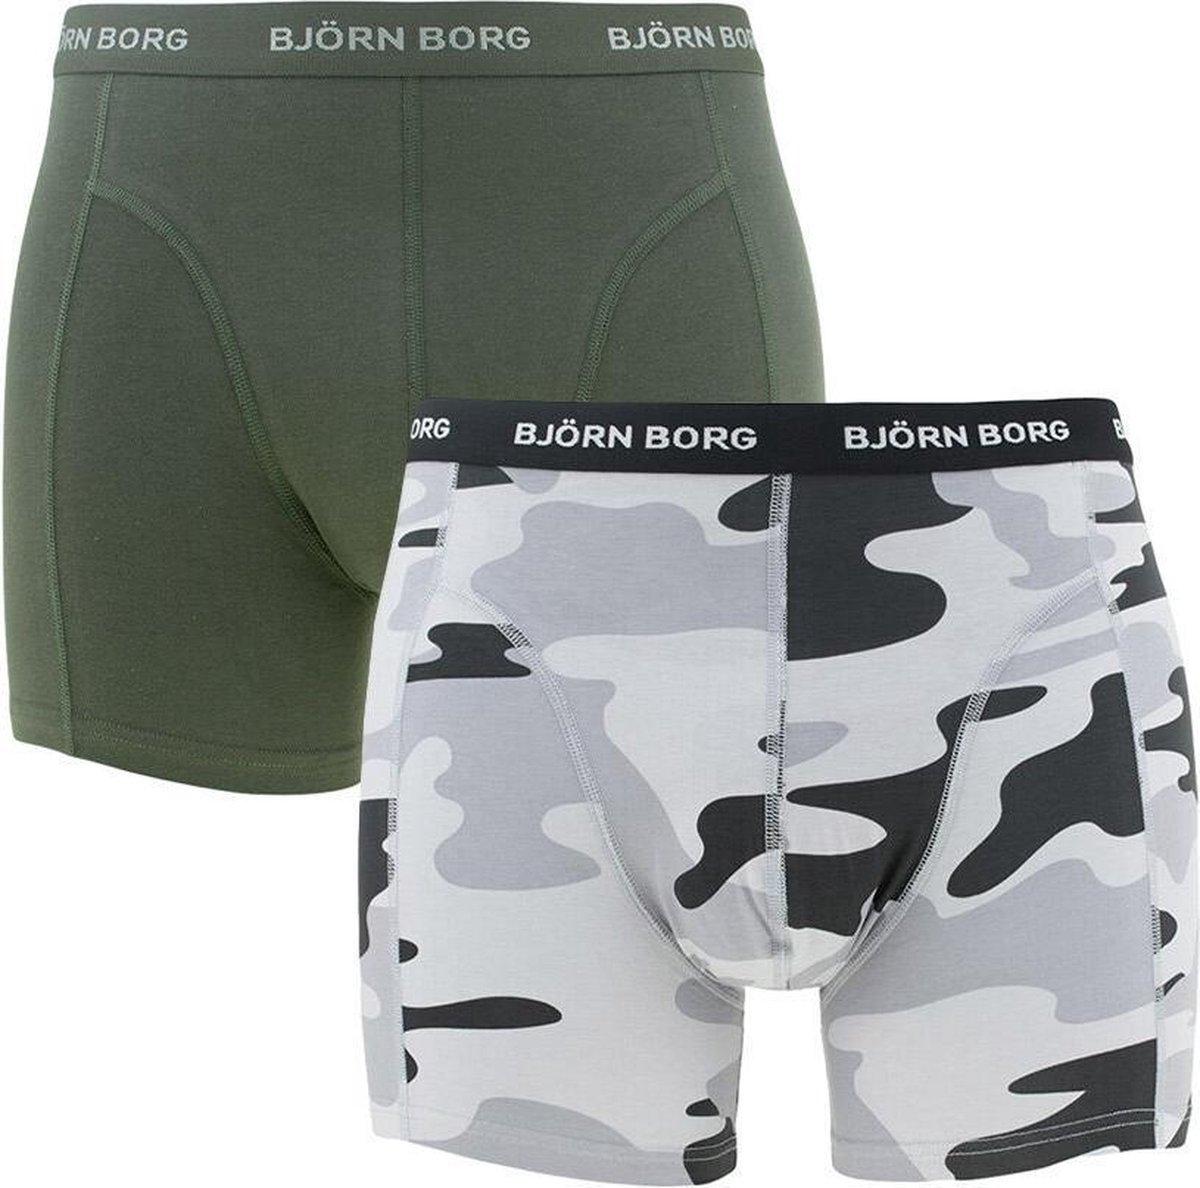 Bj rn Borg 2P Essentials Camo Heren Boxershorts - Maat M